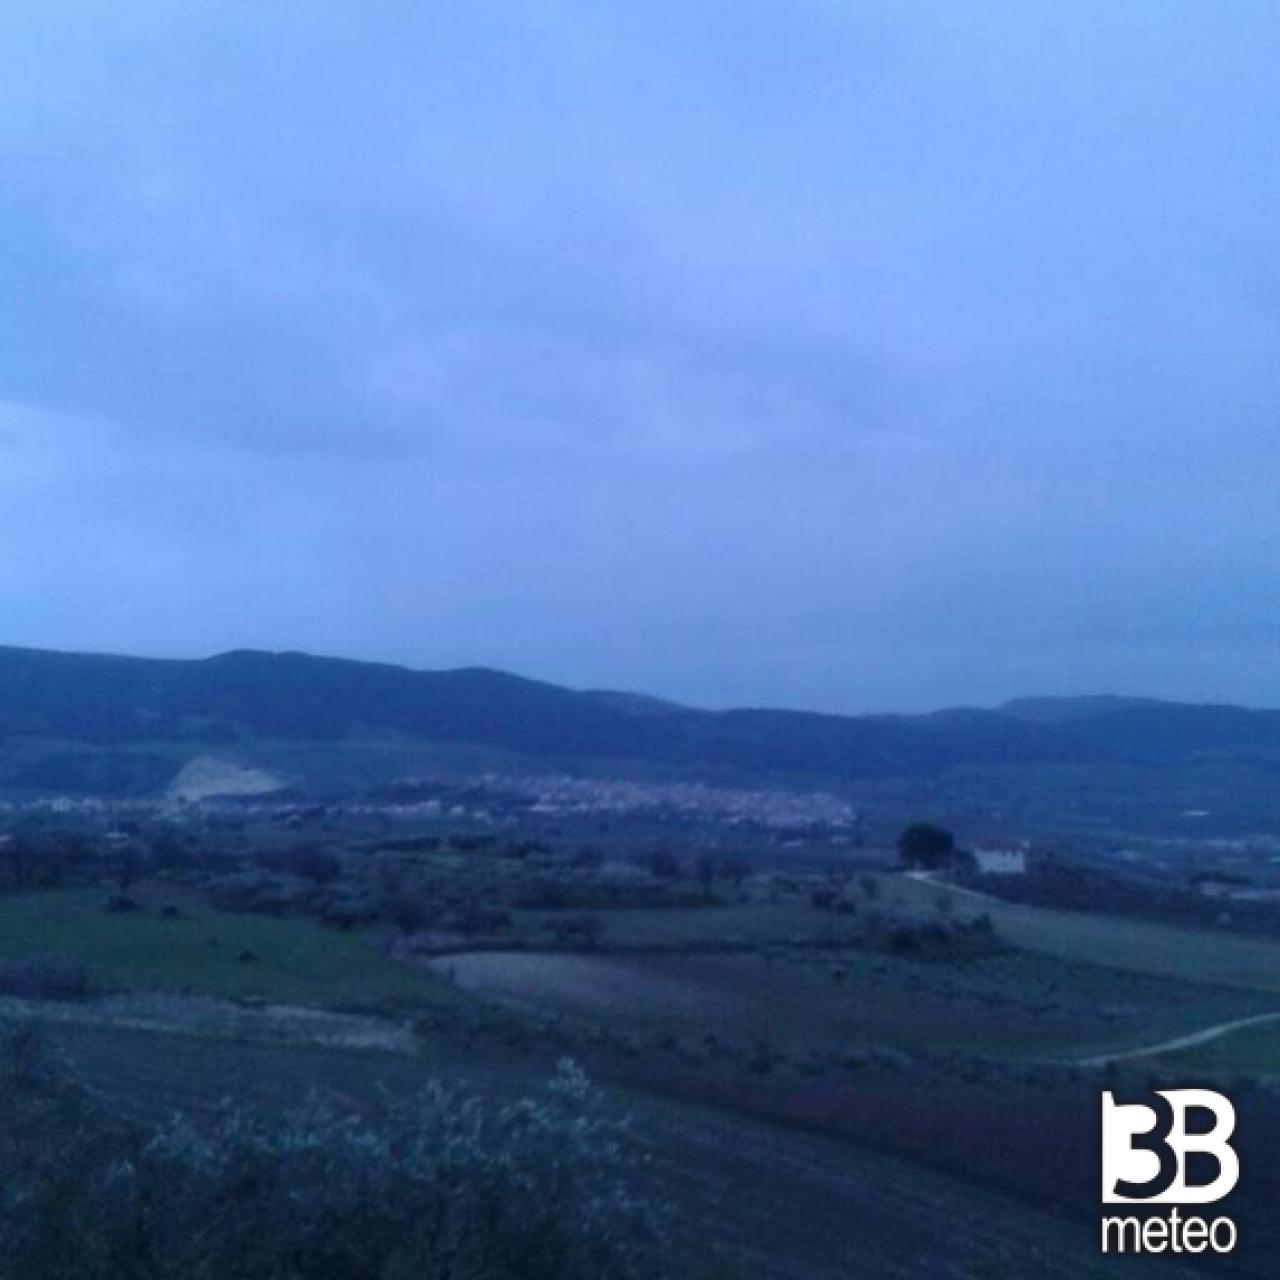 Fotosegnalazione di sambuca di sicilia foto gallery 3b meteo - 3b meteo bagno di romagna ...